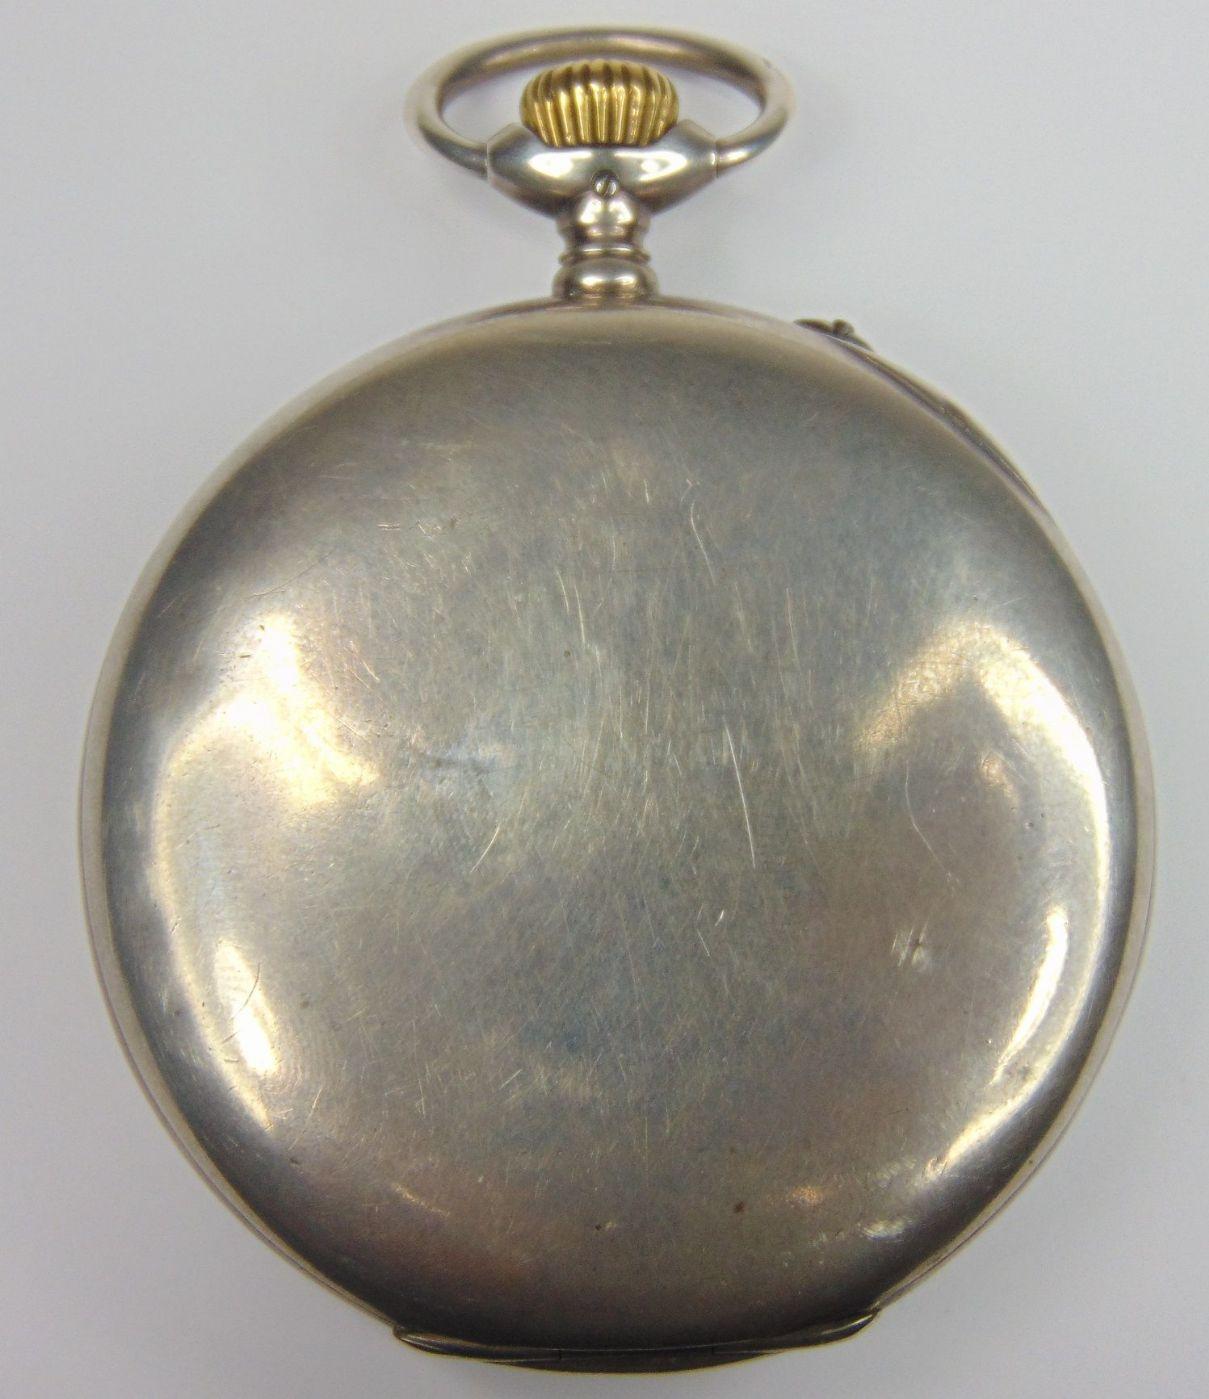 thumb2|Orologio da tasca in argento International Watch Co. fine '800